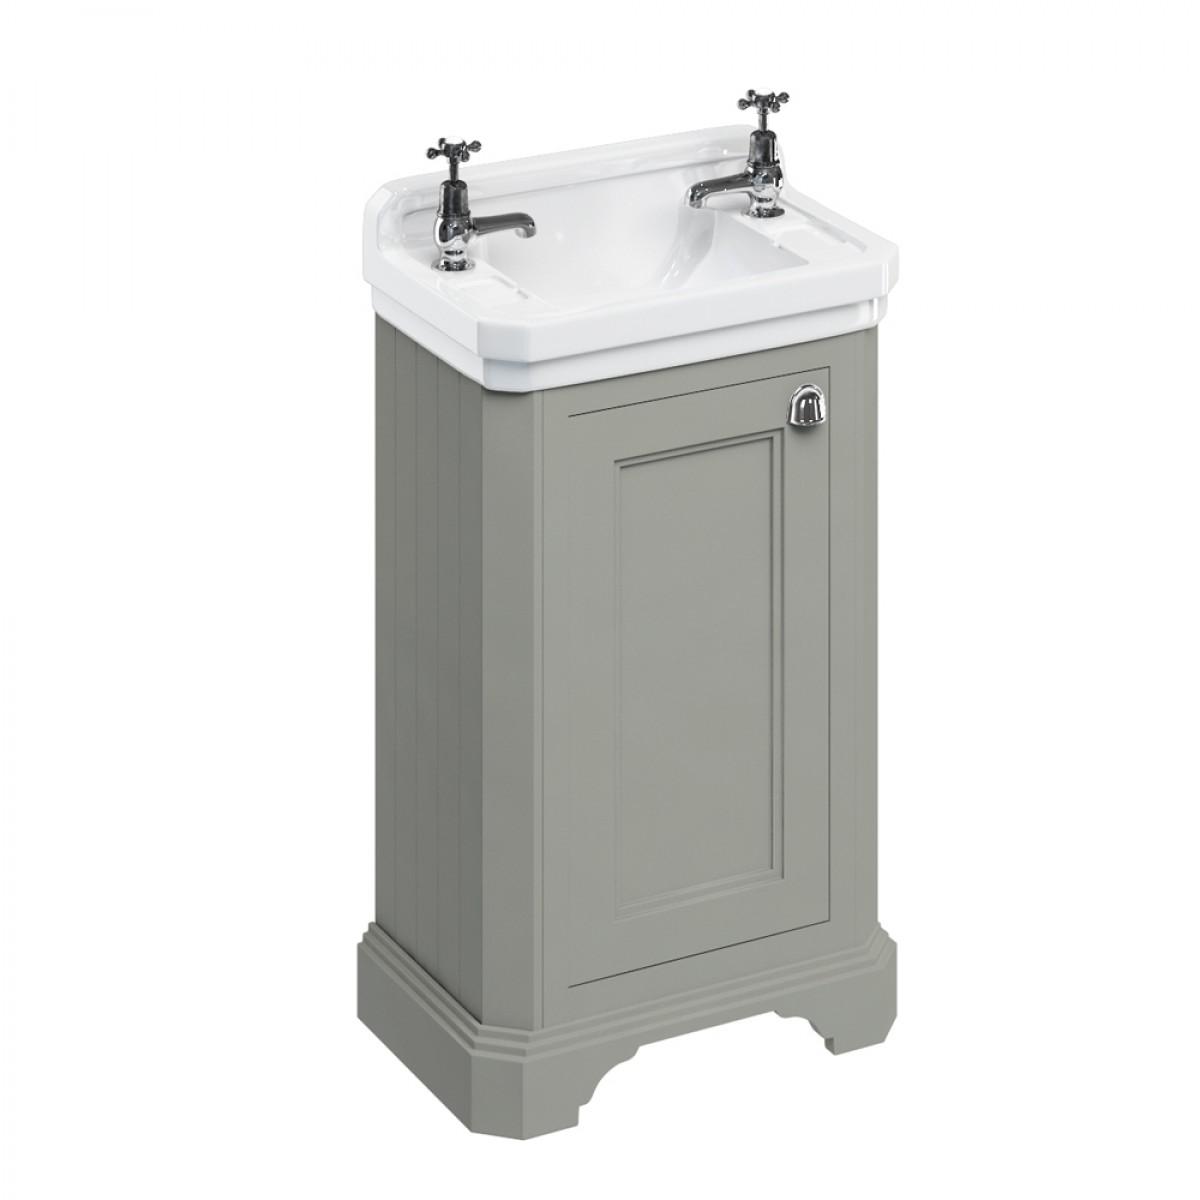 burlington freestanding cloakroom vanity unit with basin RZSFCCV